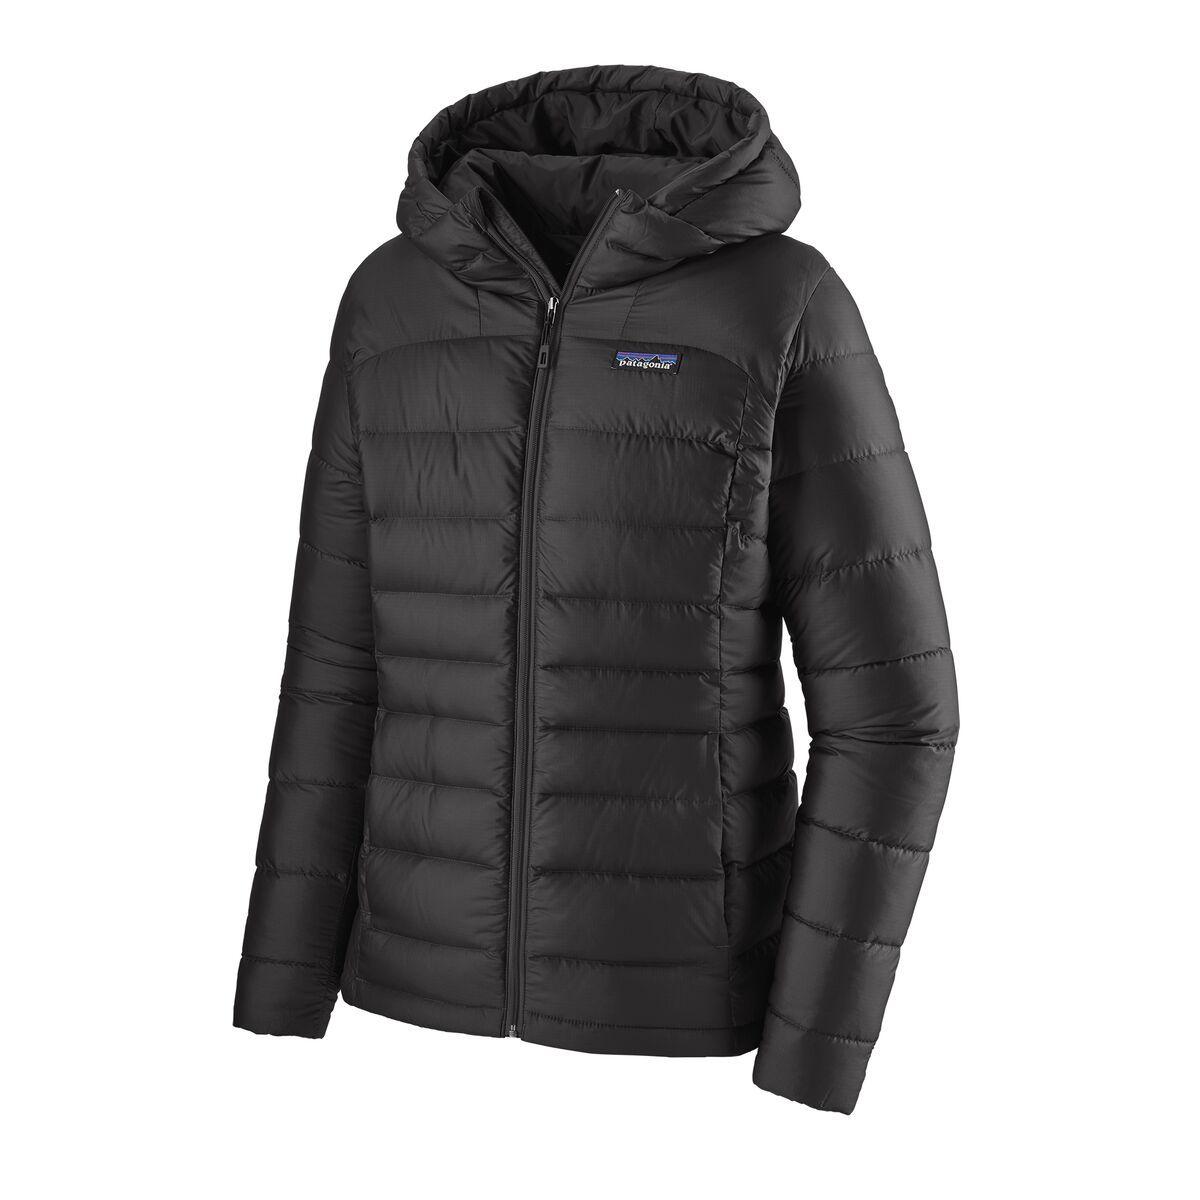 Patagonia Down Sweater Hoody Damen Navy Blue Kaufen Im